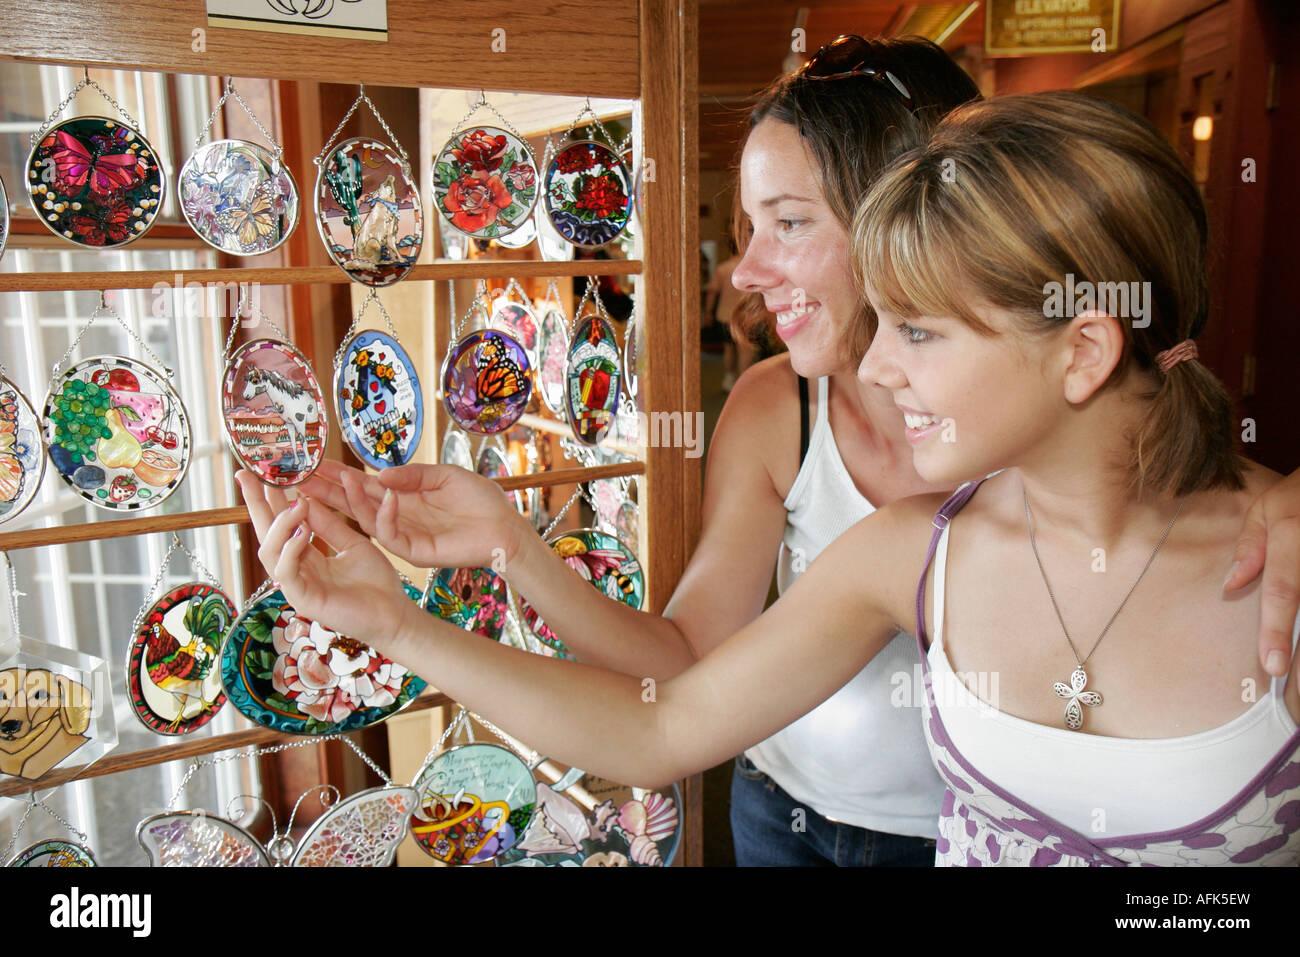 Ukrainian women dating 931 aufrufe